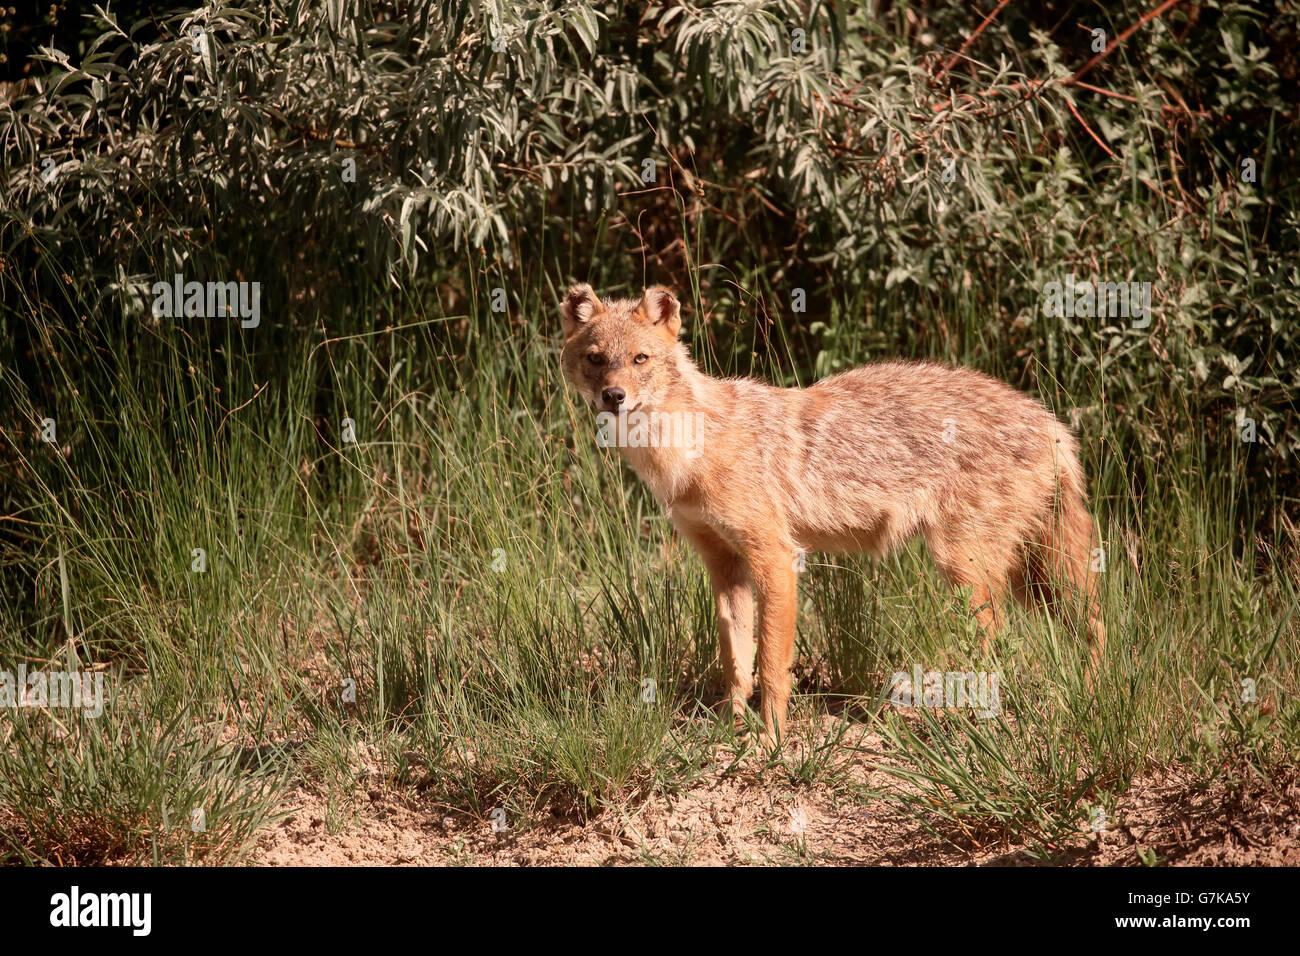 Jackal europea, Canis aureus moreoticus, unico mammifero su erba, Romania, Giugno 2016 Foto Stock